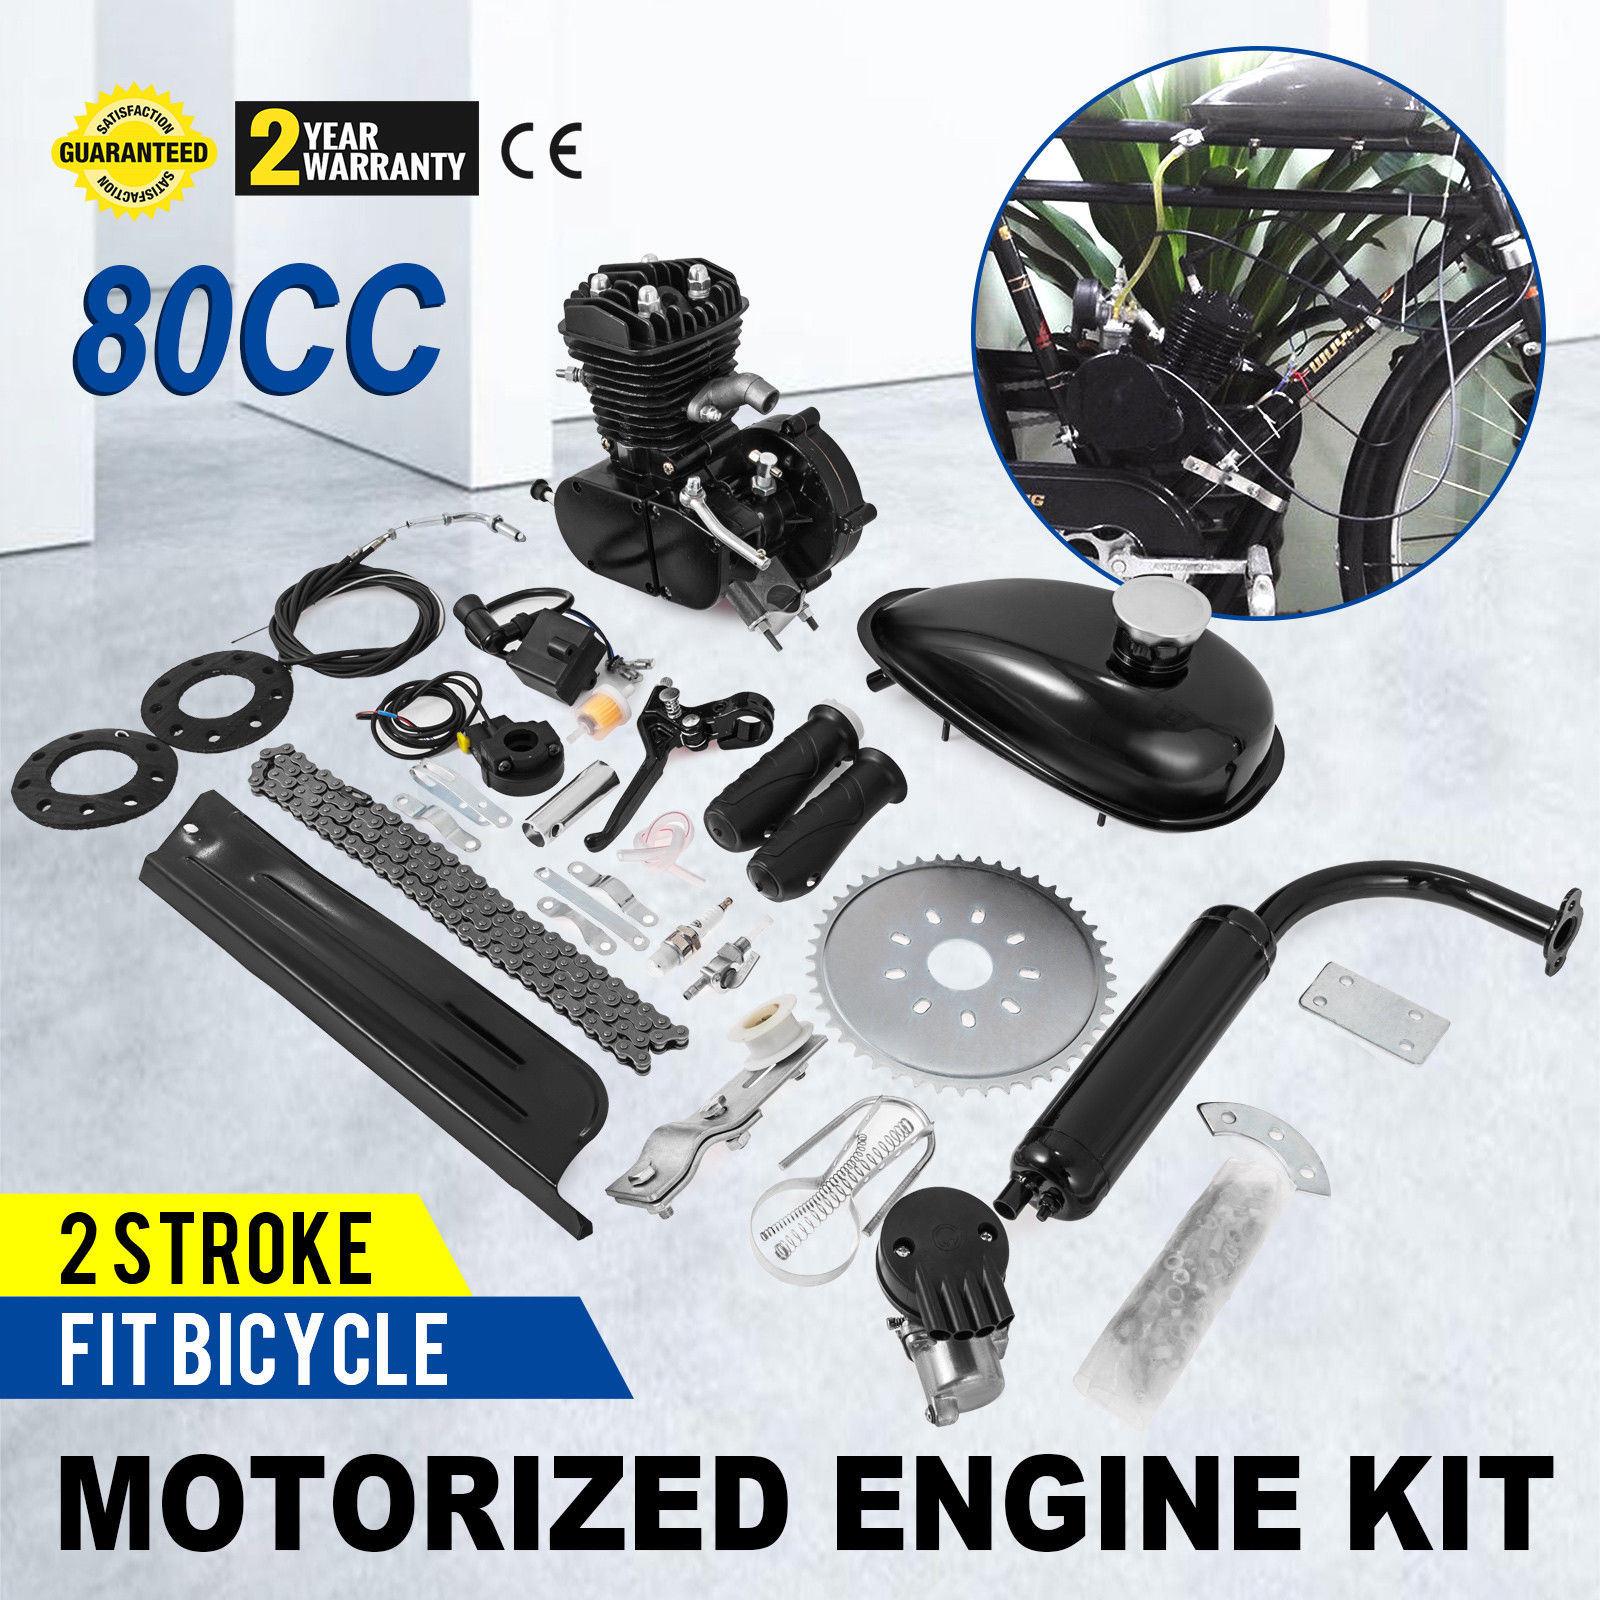 Petrol Fuel Tank for Motorised Push Bike Motorized Bicycle Engine Kit Part 3L